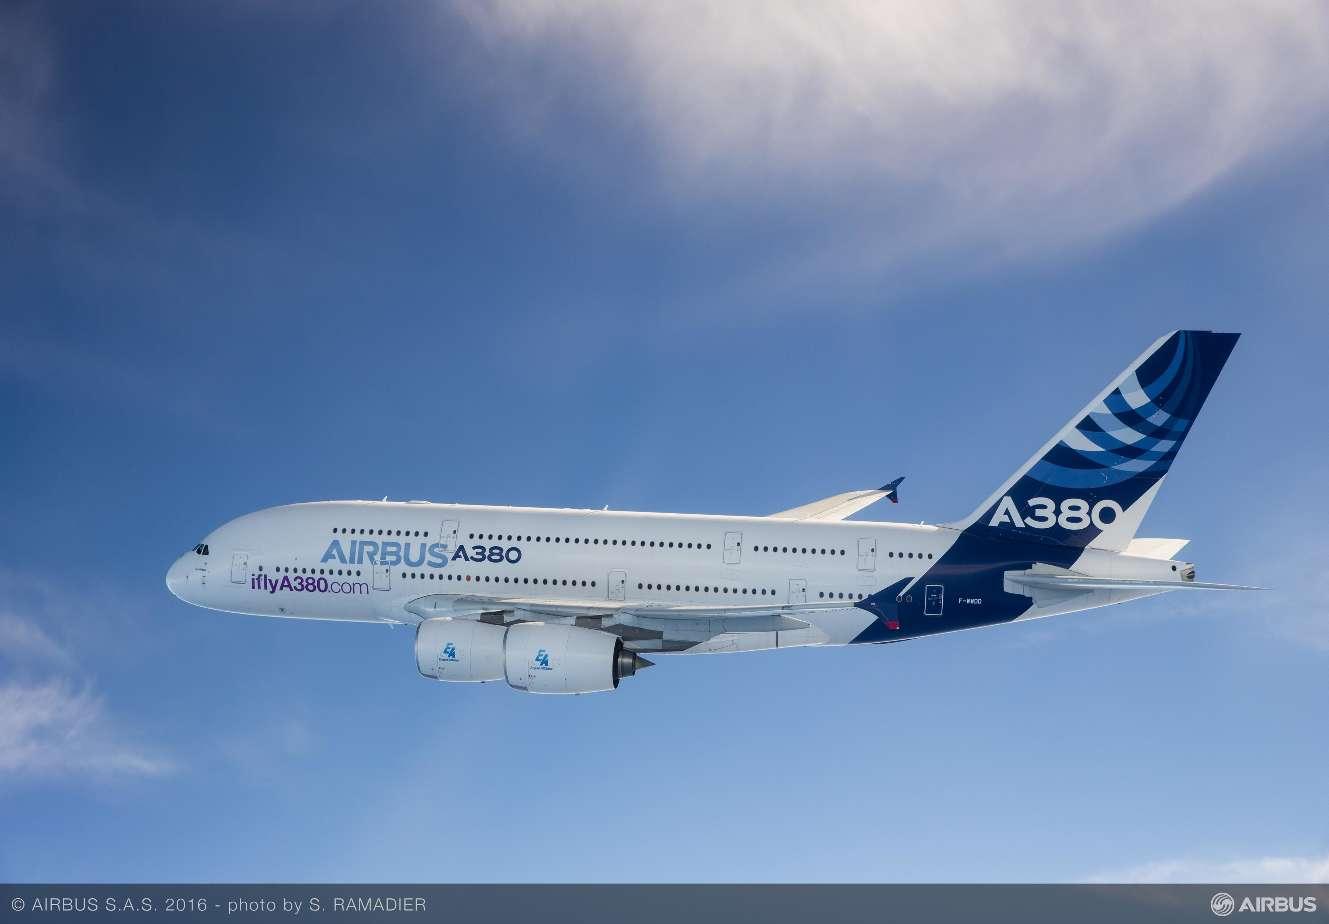 Un A380 va au Musée de l'Air et de l'Espace